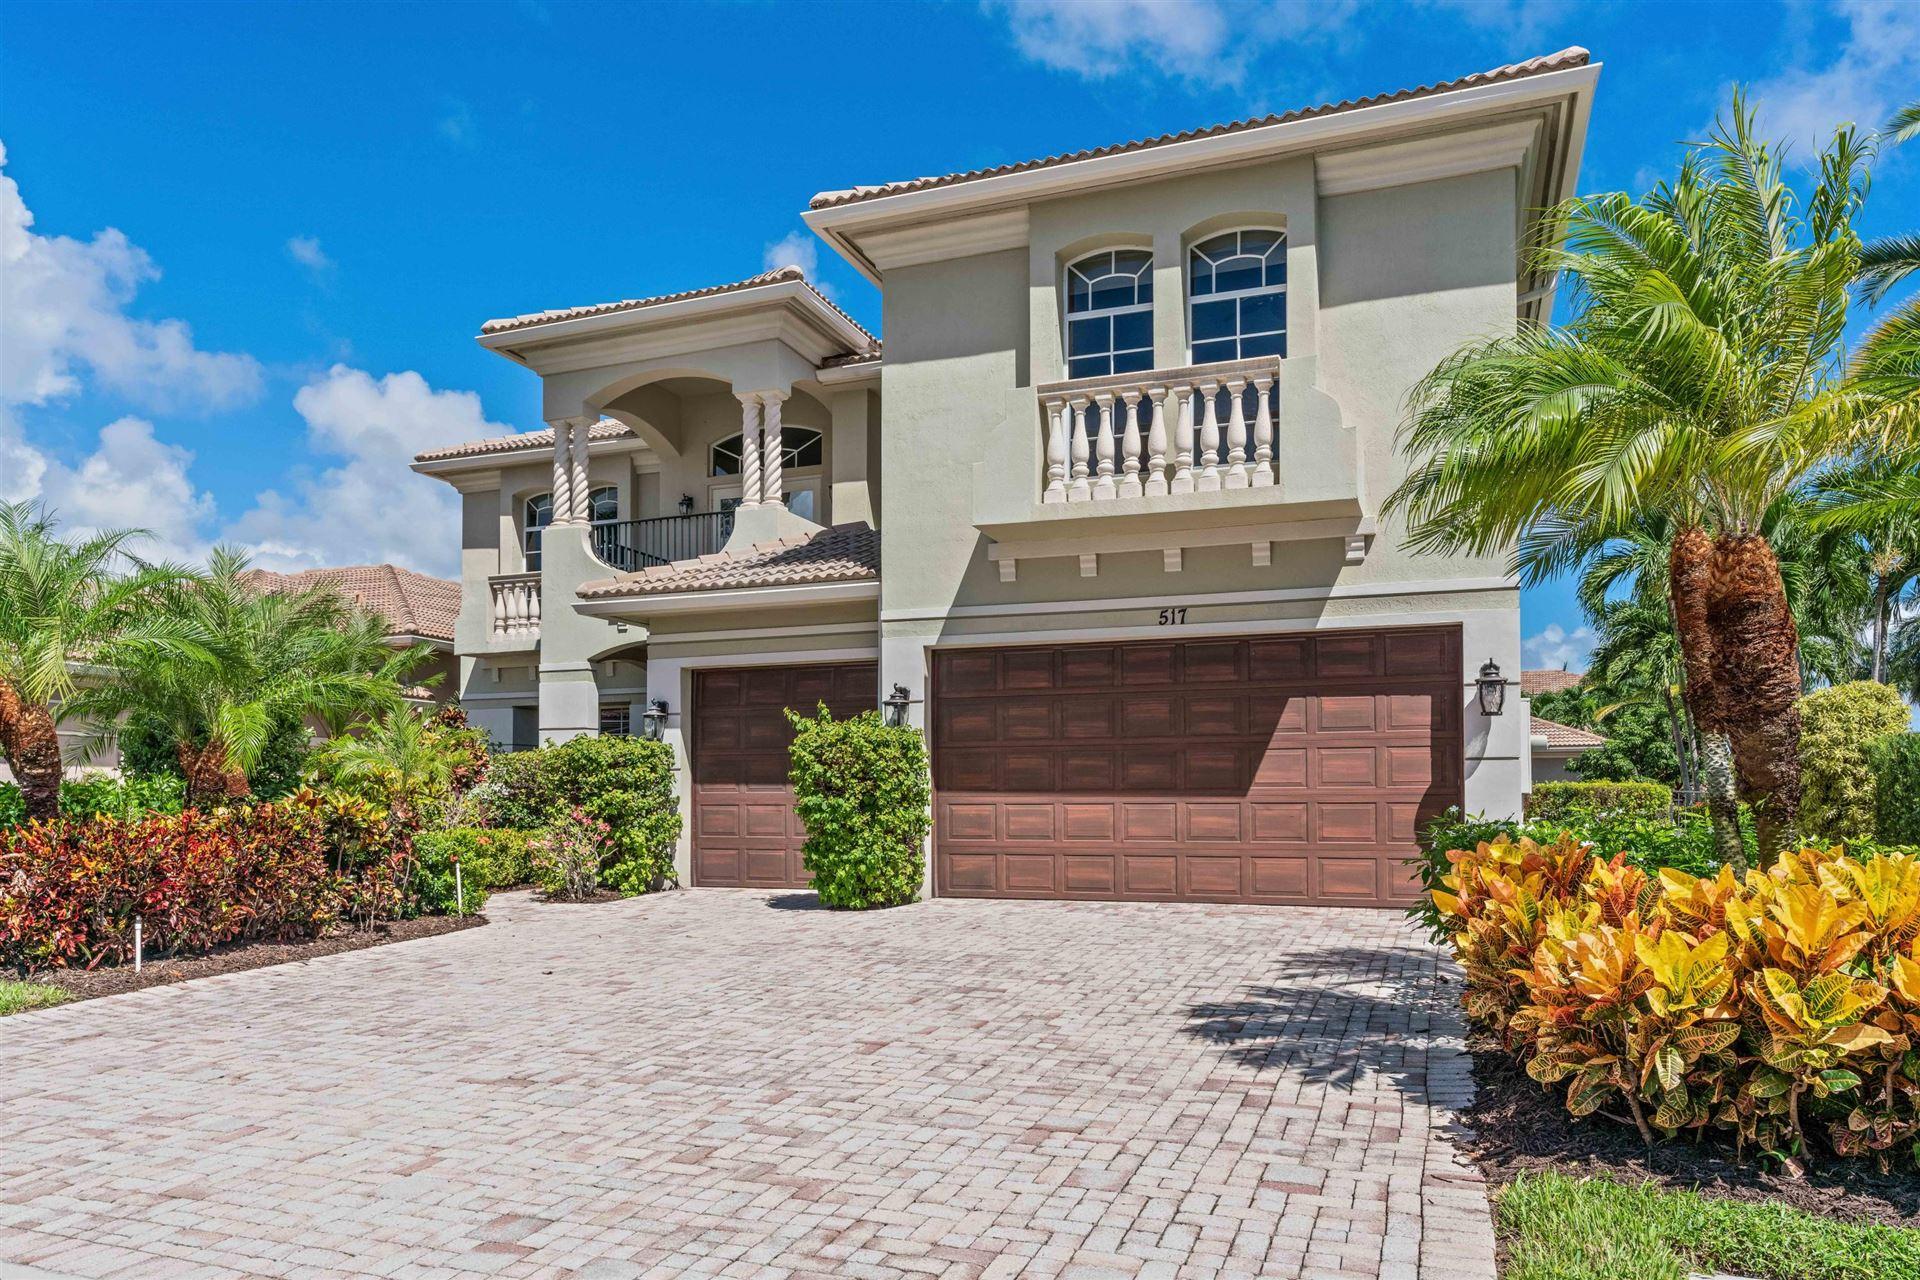 Photo of 517 Les Jardin Drive, Palm Beach Gardens, FL 33410 (MLS # RX-10650781)